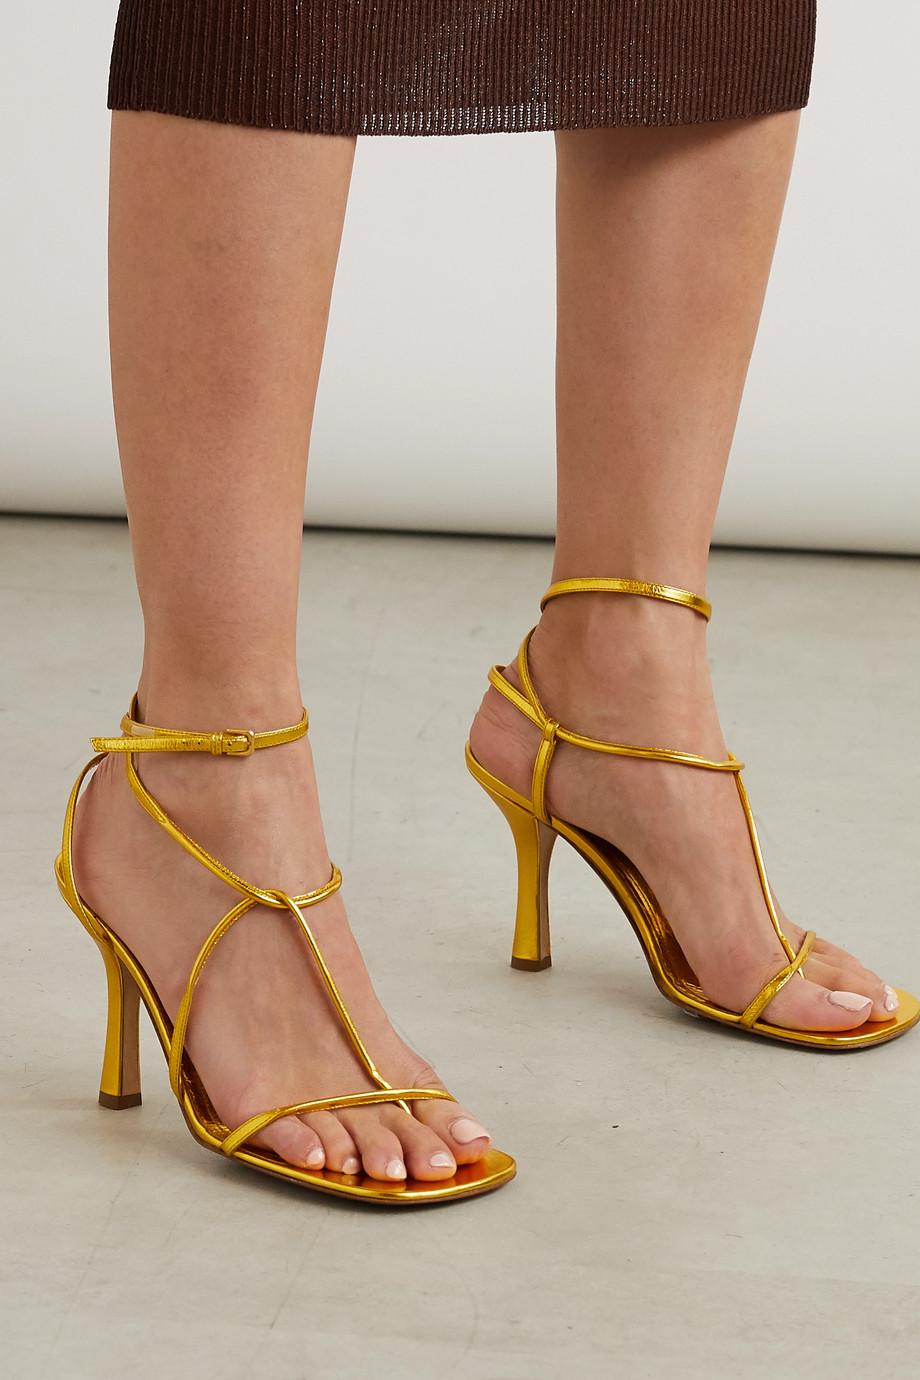 Bottega Veneta 金属感皮革凉鞋